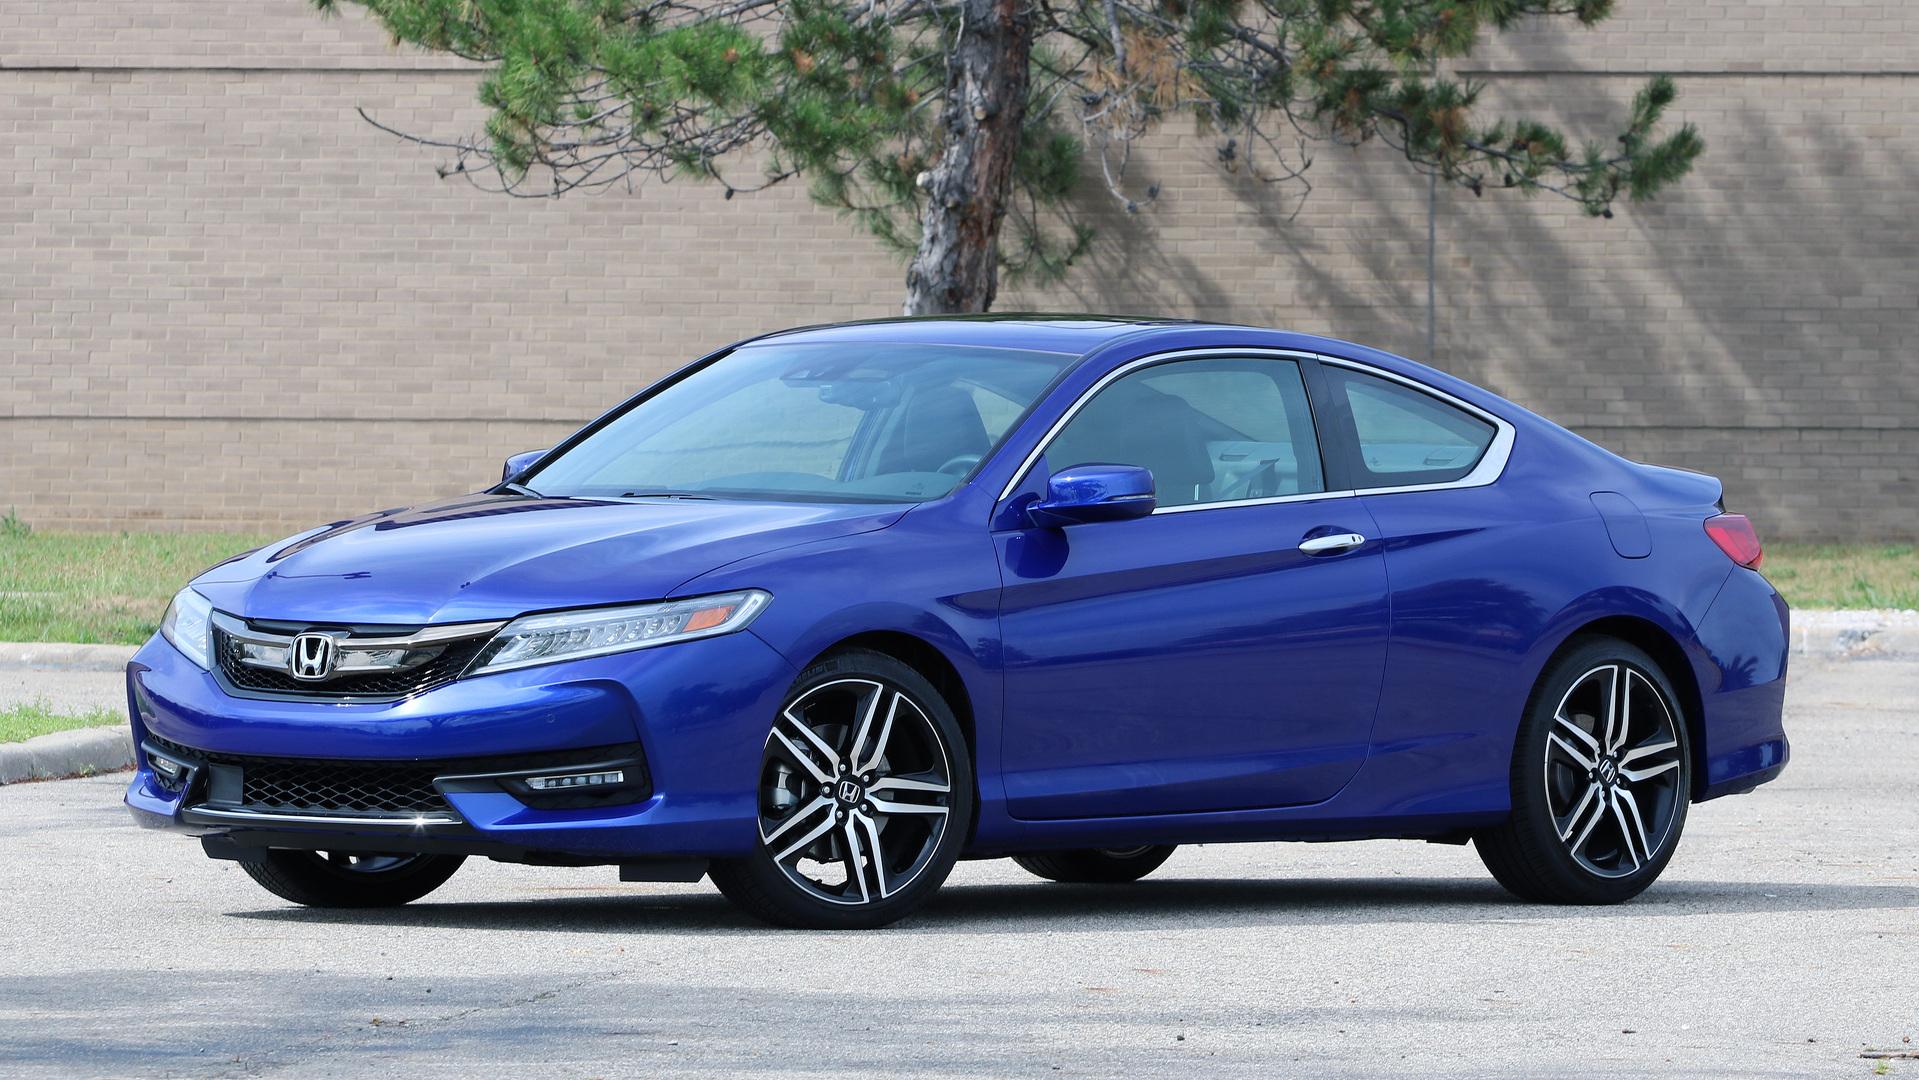 news coupe com for cars accord articles drops honda